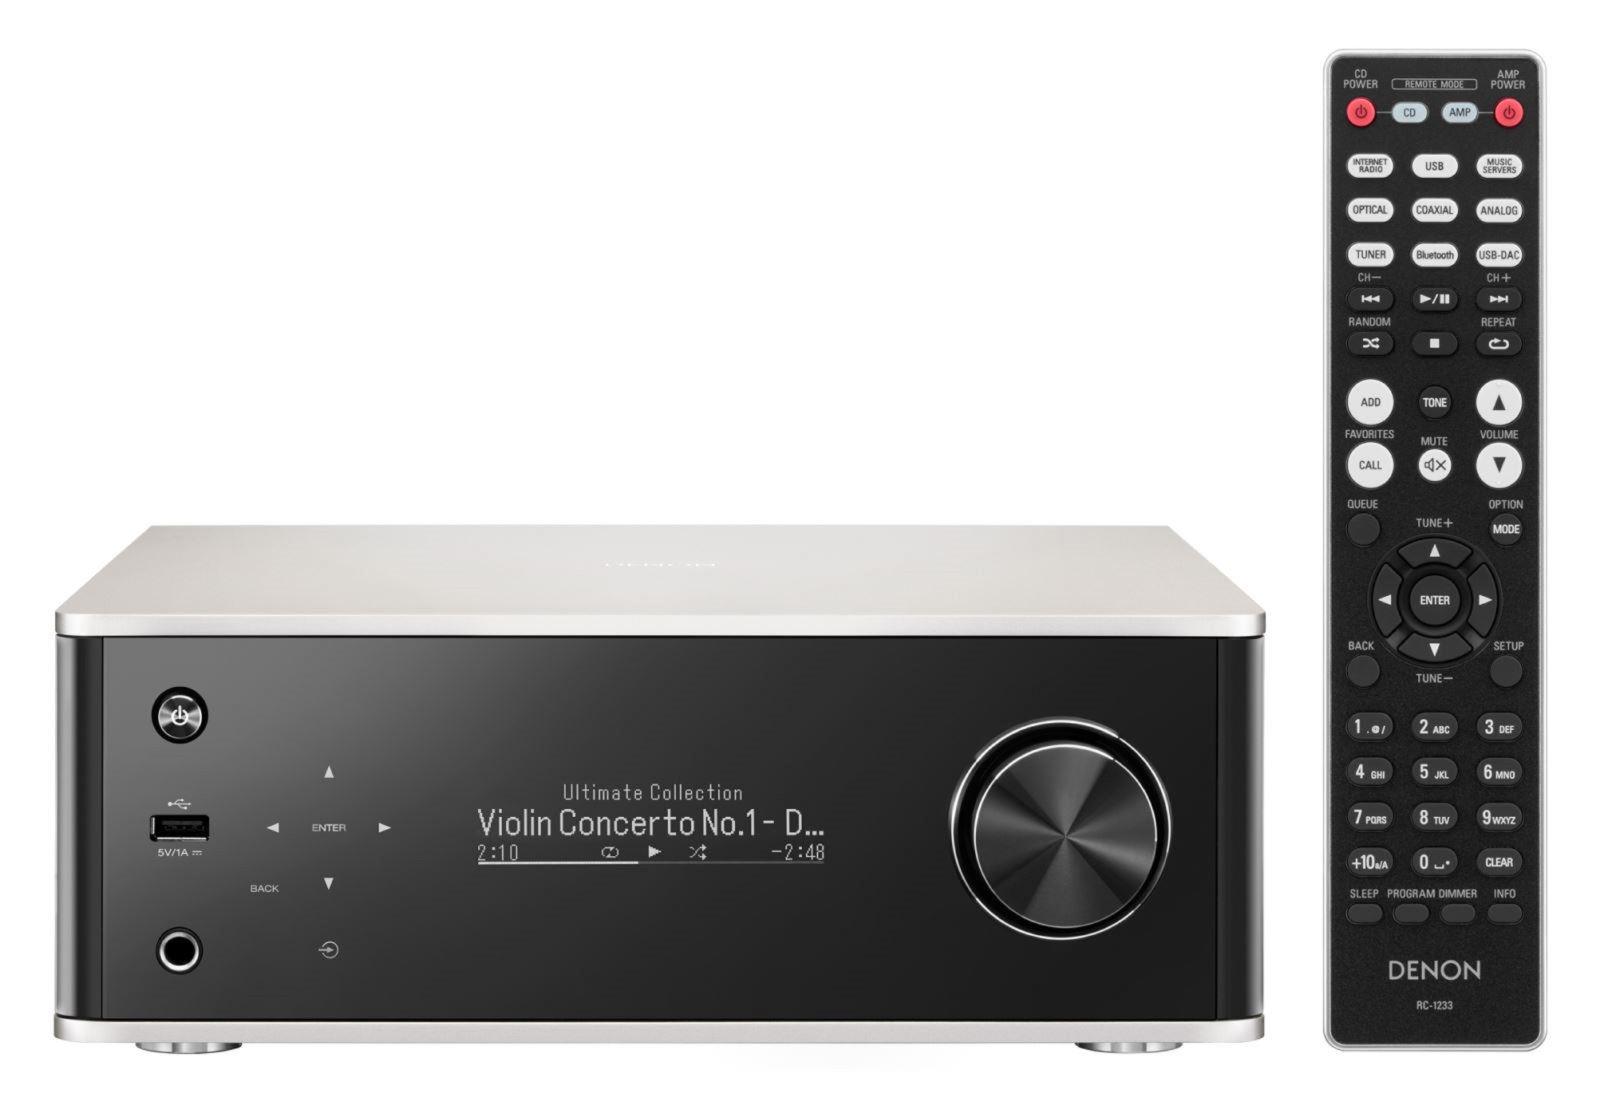 Denon ra mắt sản phẩm mới: Ampli DenonPMA-150H